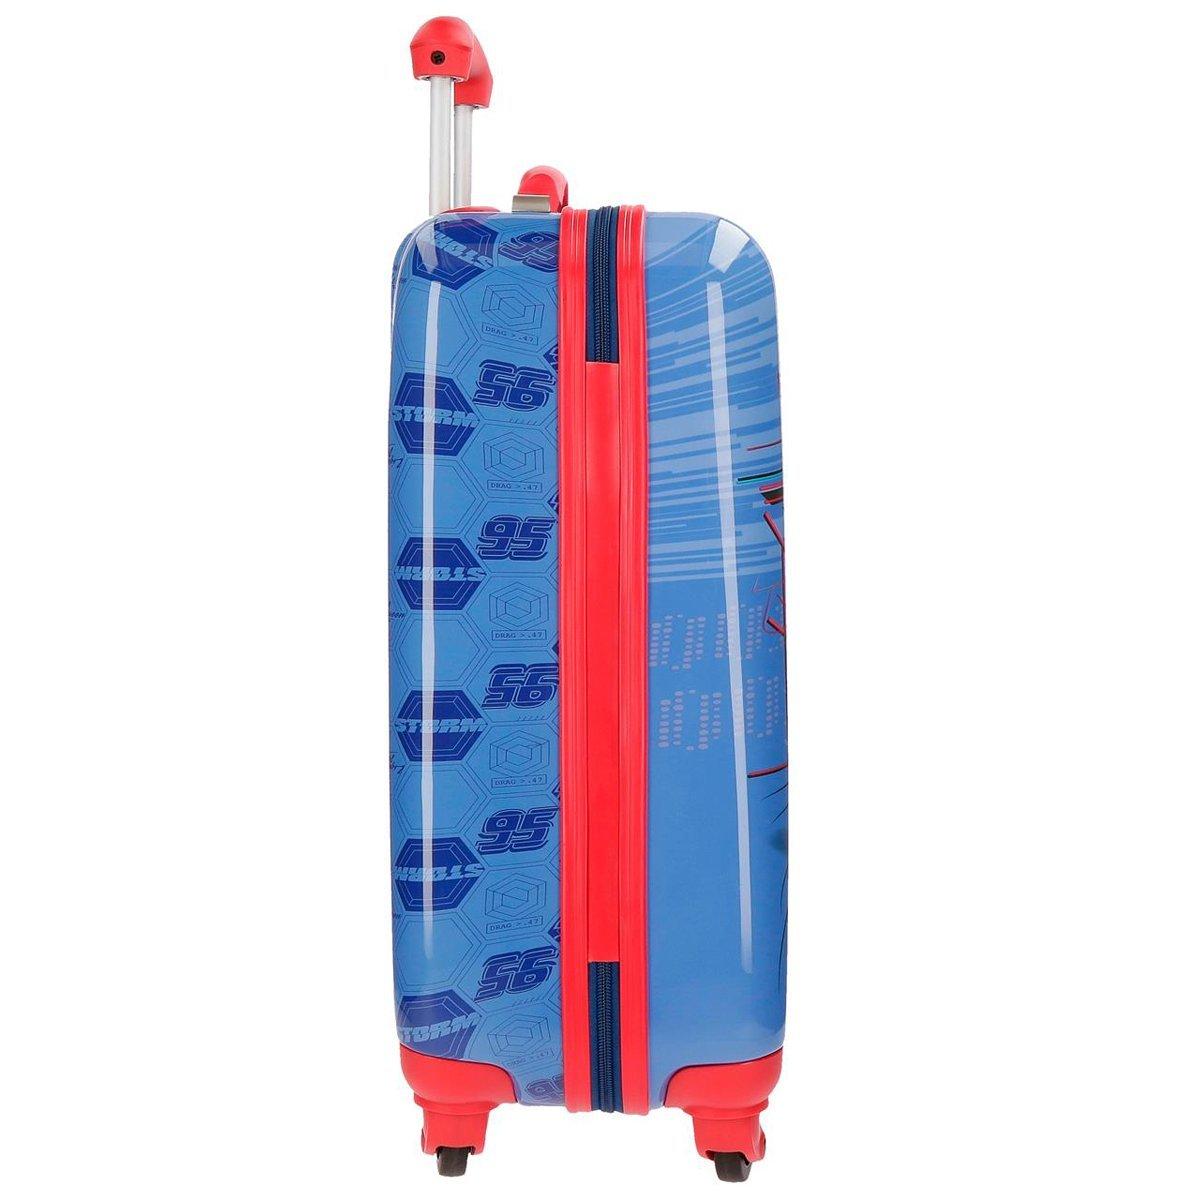 Valise cabine rigide 55cm Gar/çon CARS ULTRA SPEED Rouge et Bleu